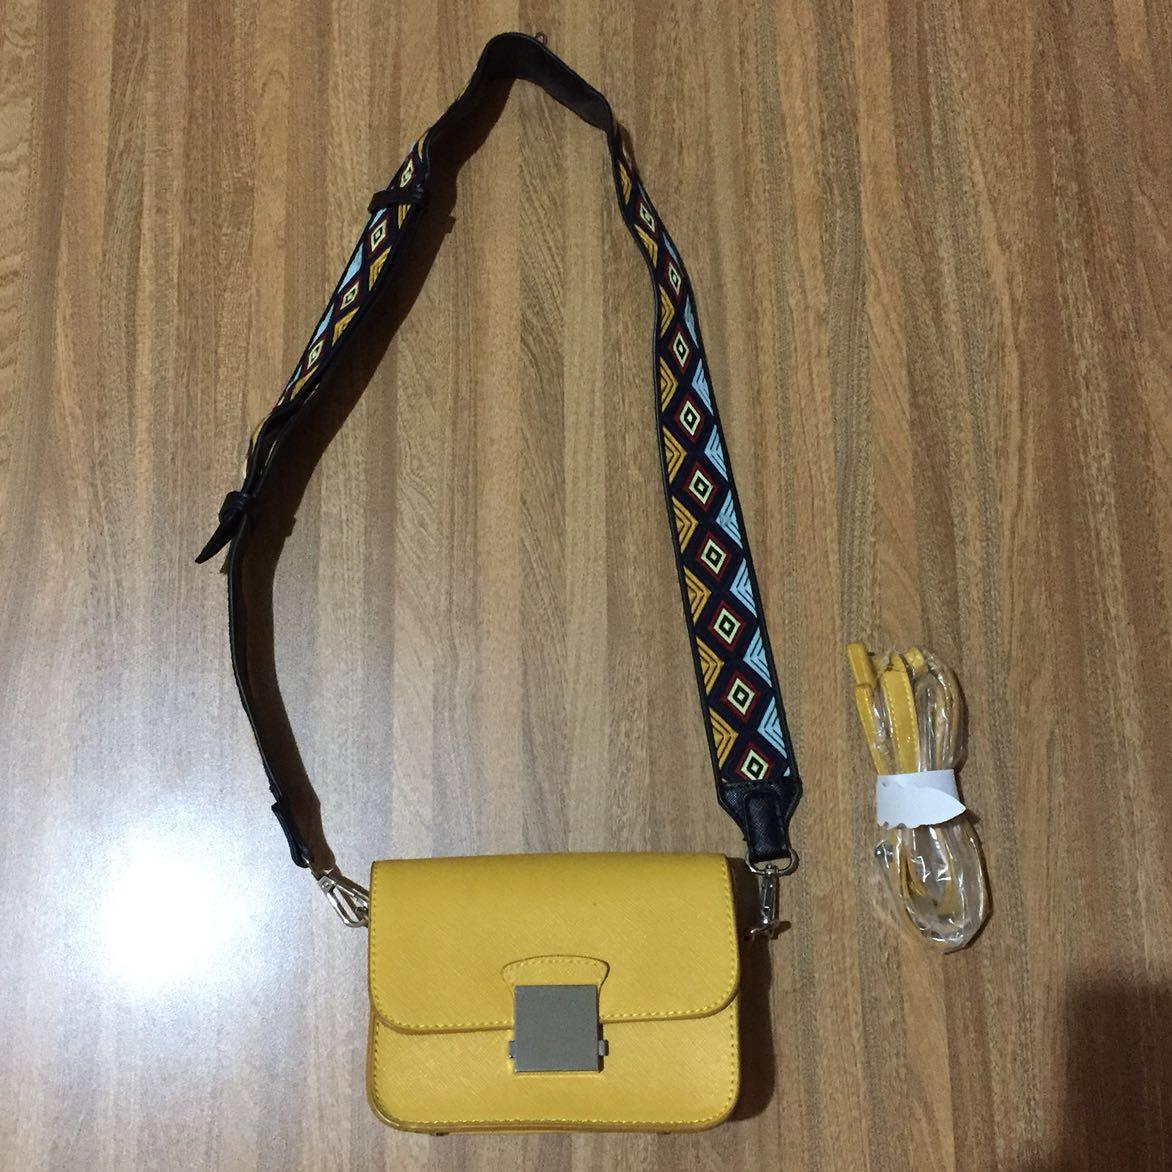 Zara yellow sling bag